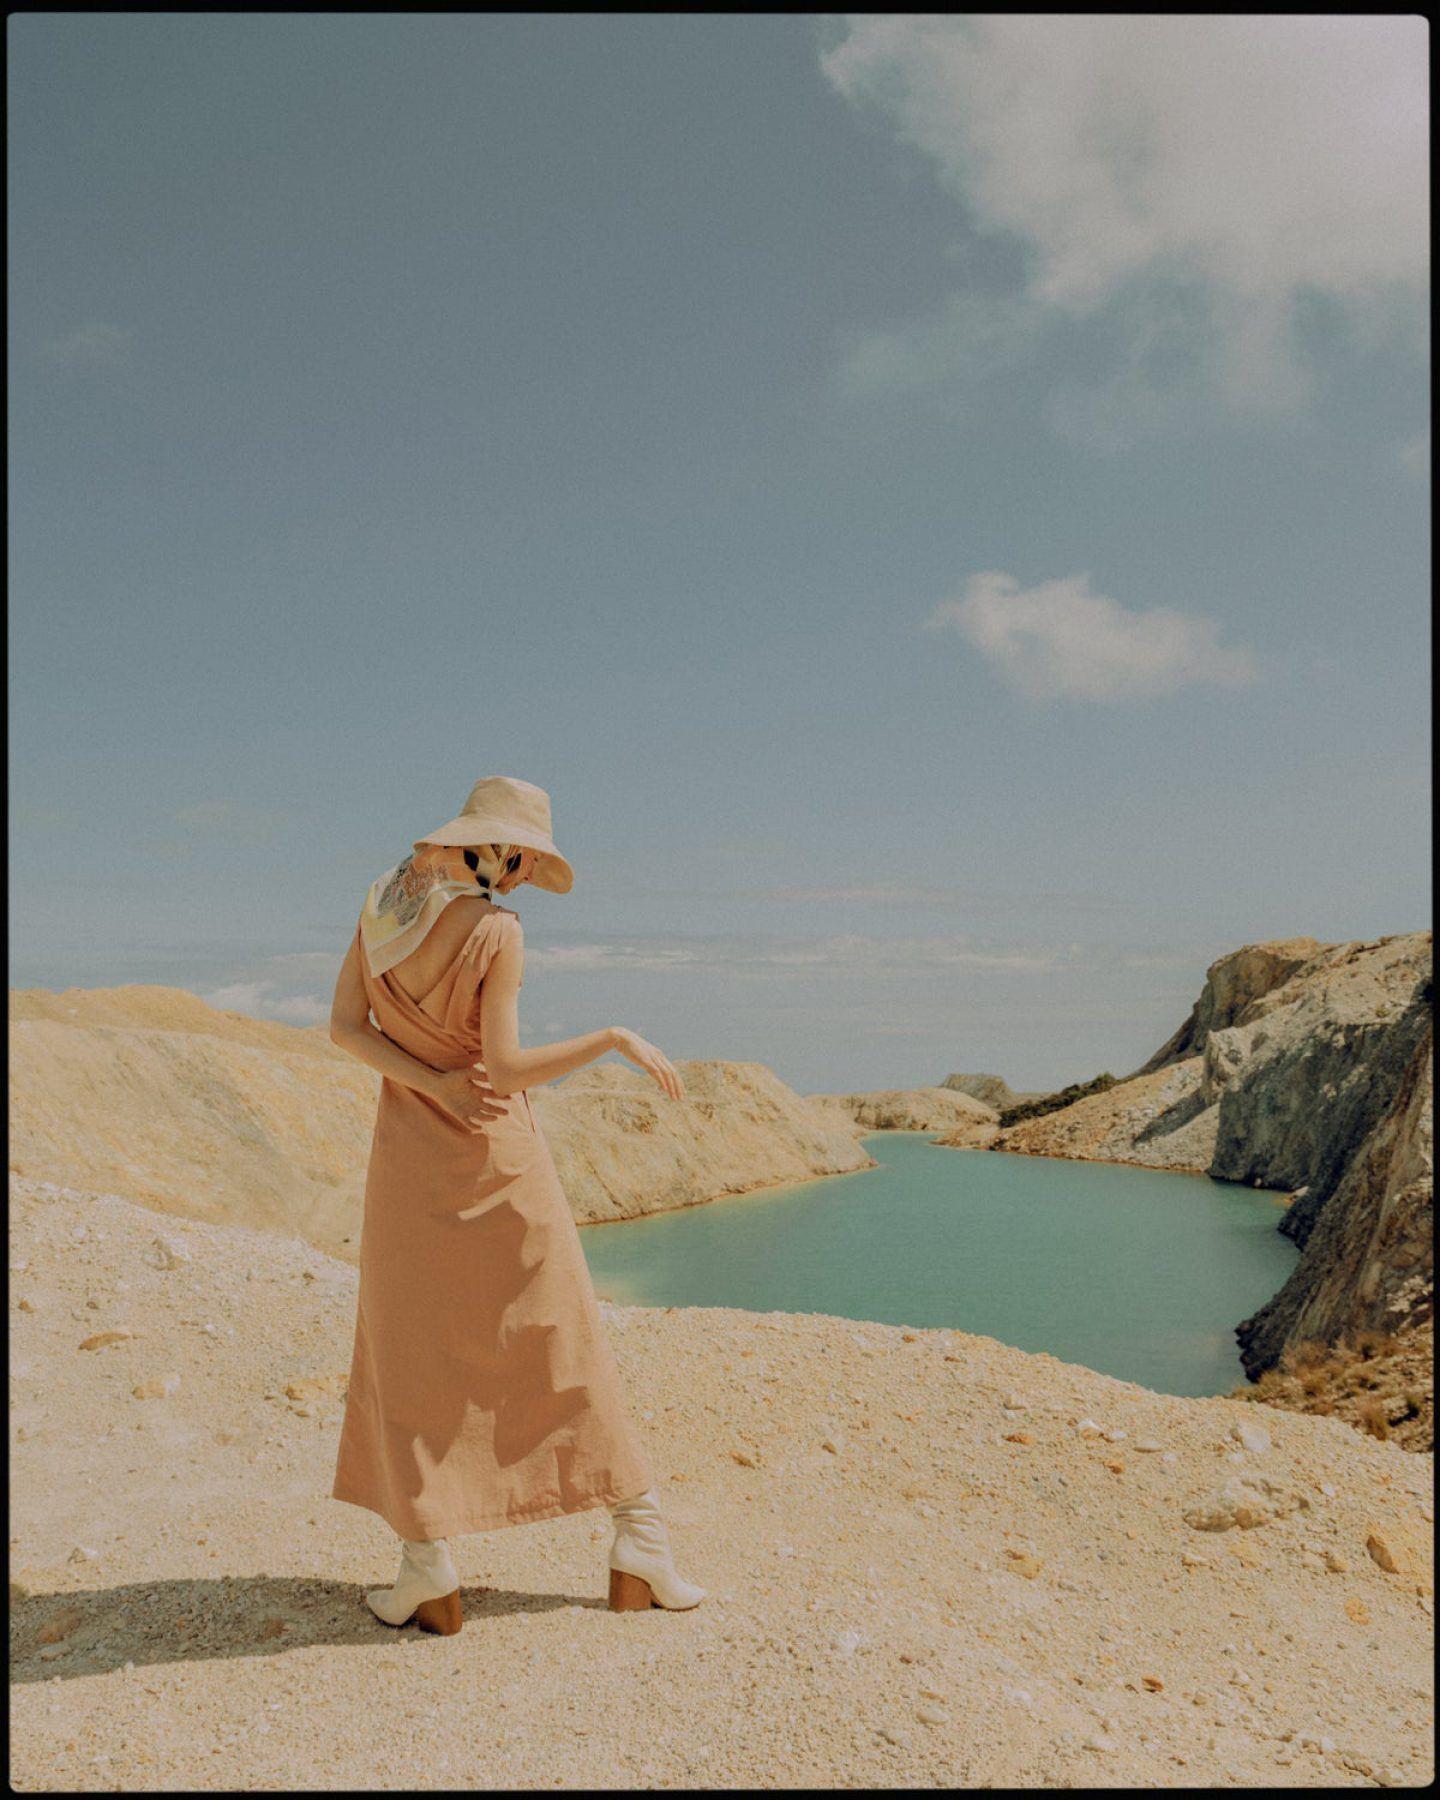 IGNANT-Photography-Daniel-Garzee-011